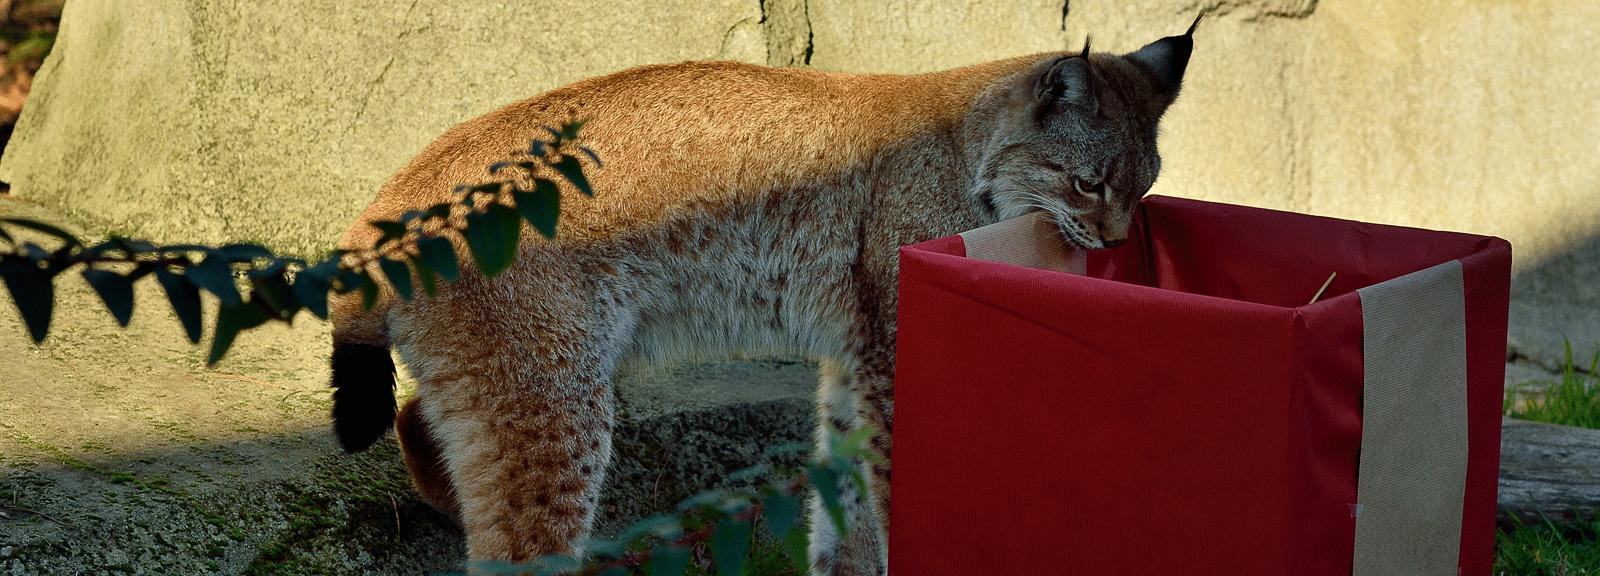 Noël au zoo © MNHN - F G. Grandin